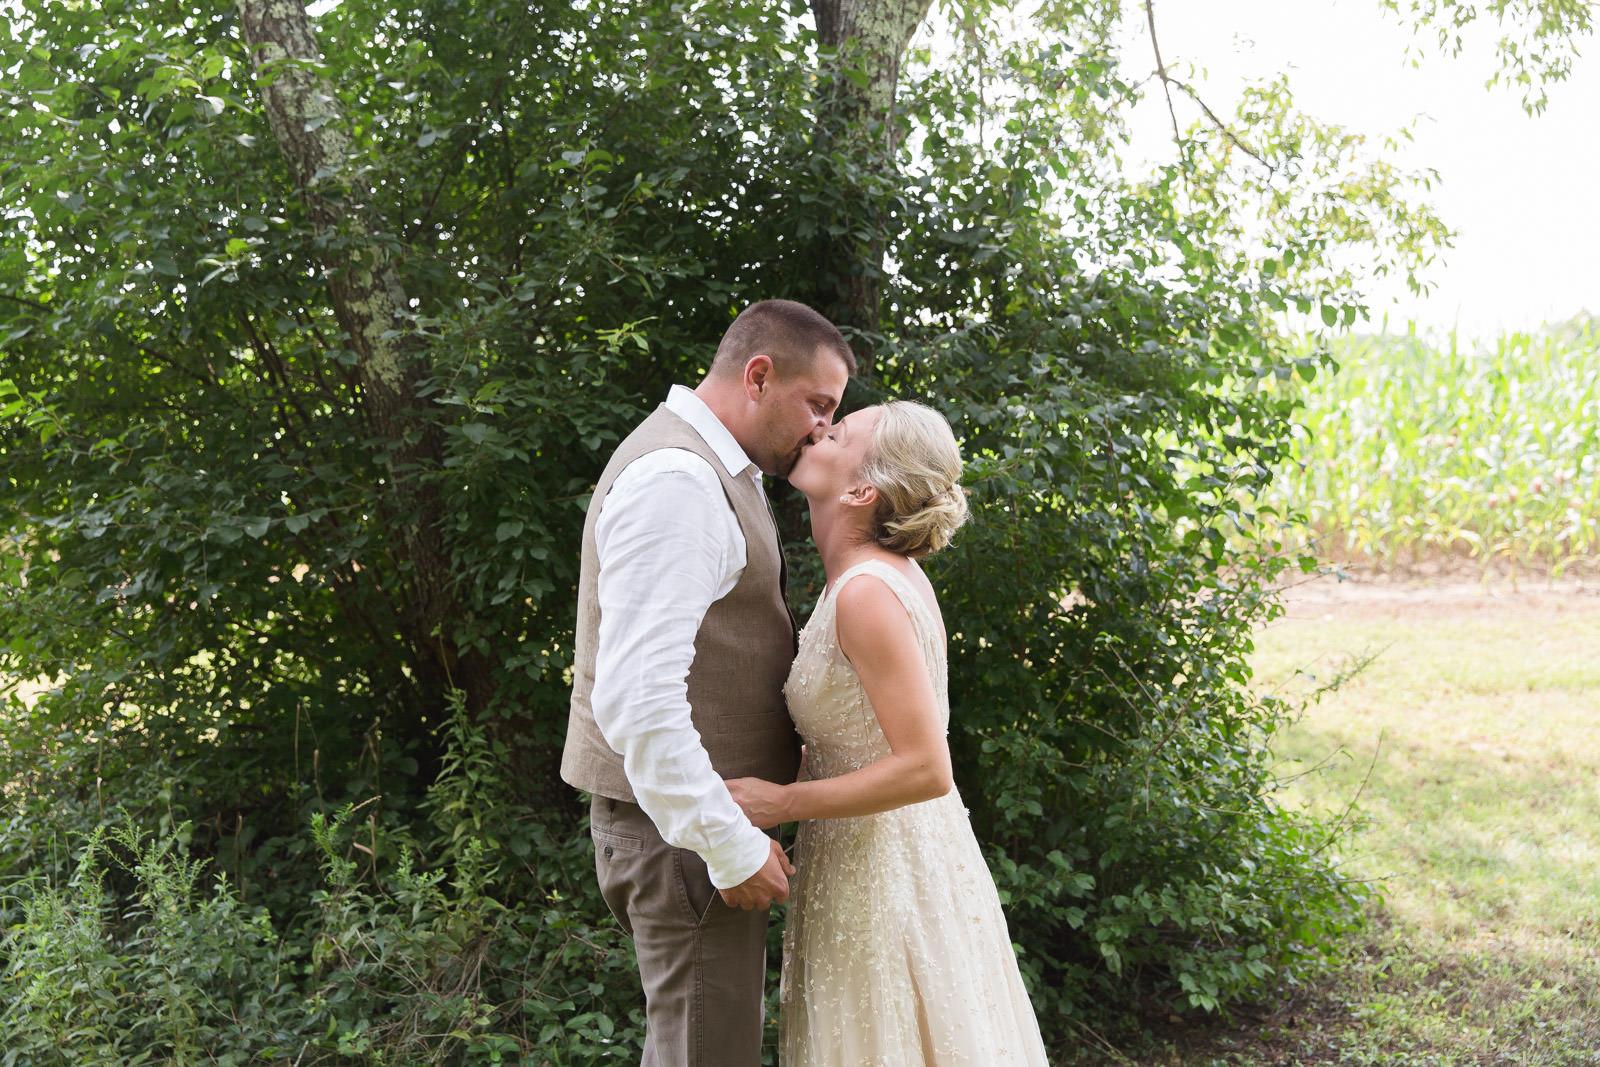 Coventry, Rhode Island, RI, Backyard Wedding, forest, earthy, wedding, tracy jenkins photography, wedding photographer, ri wedding photographer, Rhode Island Wedding photographer, first look, bride, groom, ivory dress